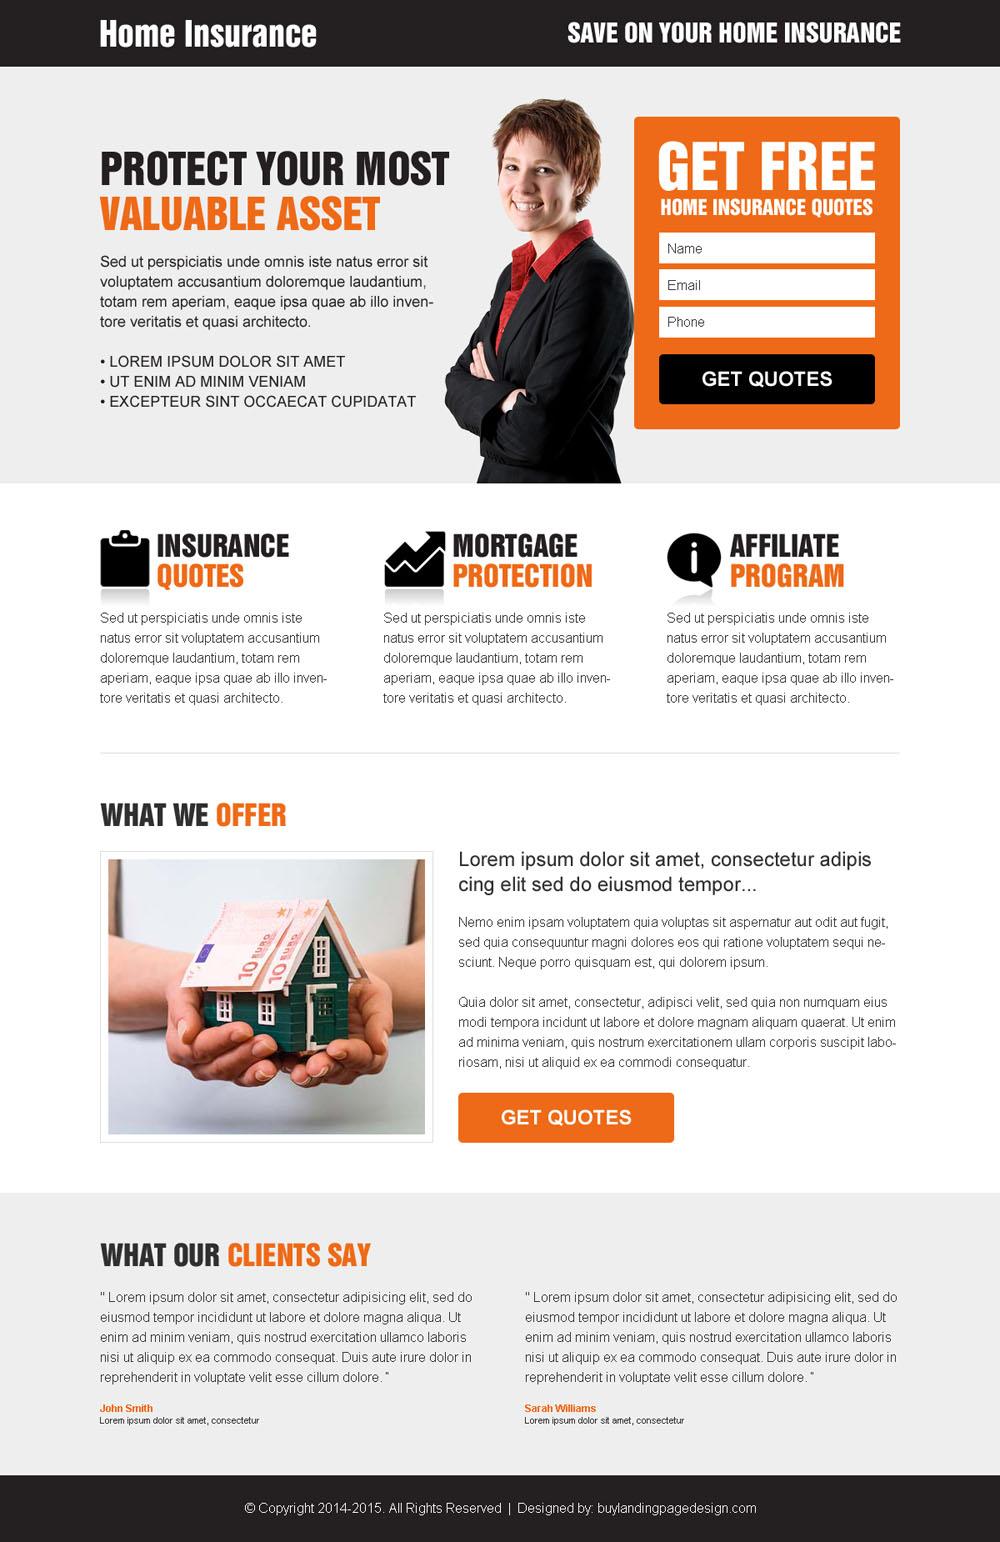 homeinsurancequoteleadcaptureres1 Home Insurance